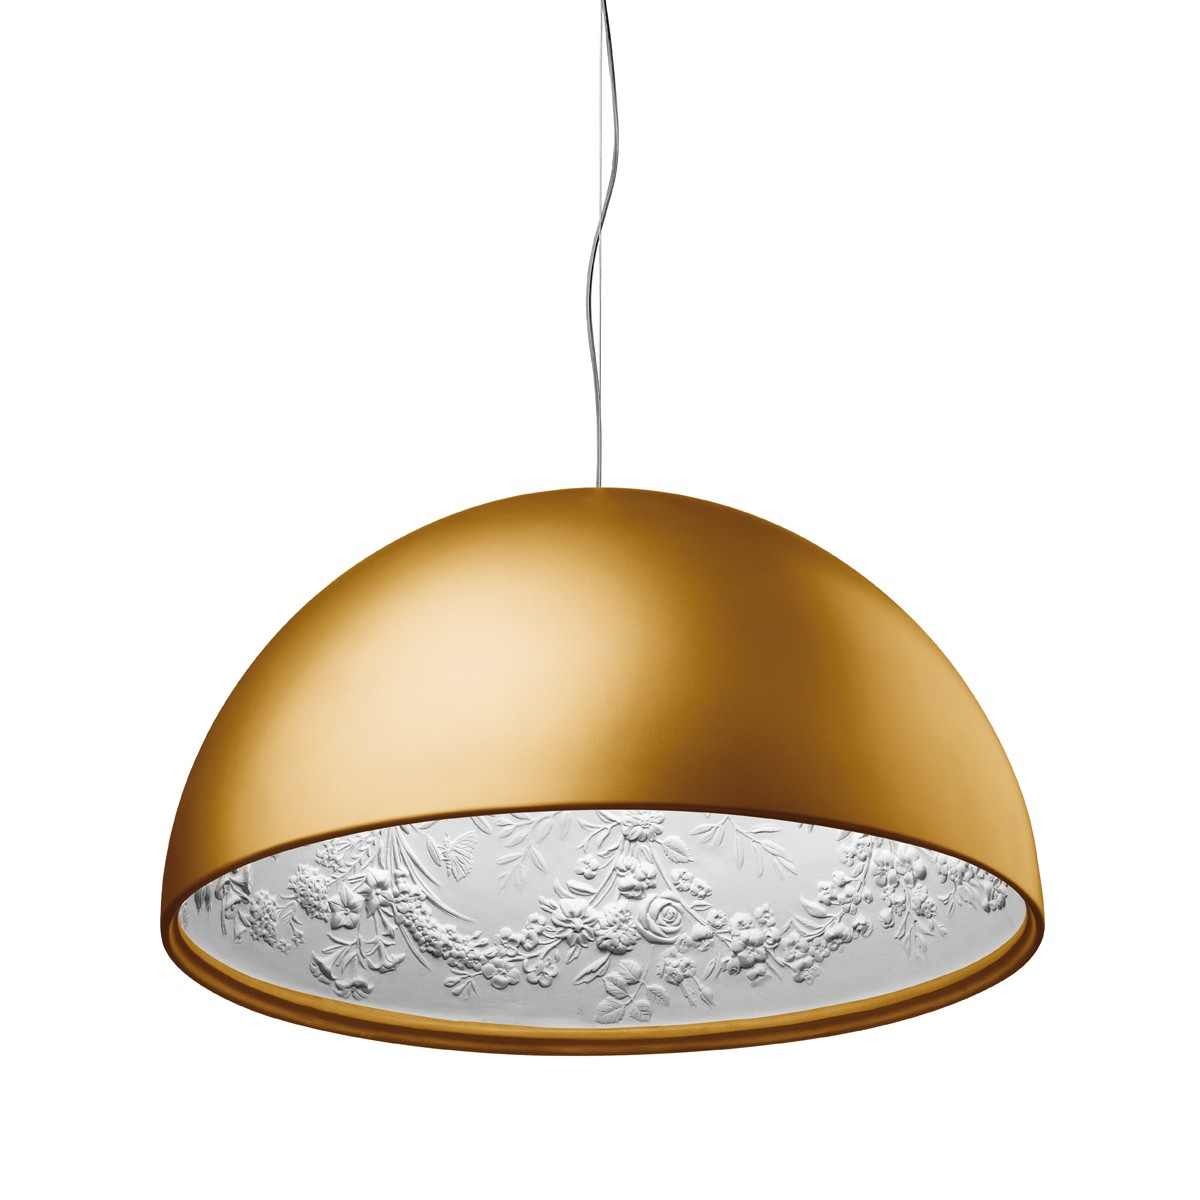 Flos Skygarden Eco Pendelleuchte, Ø: 90 cm, Gold matt